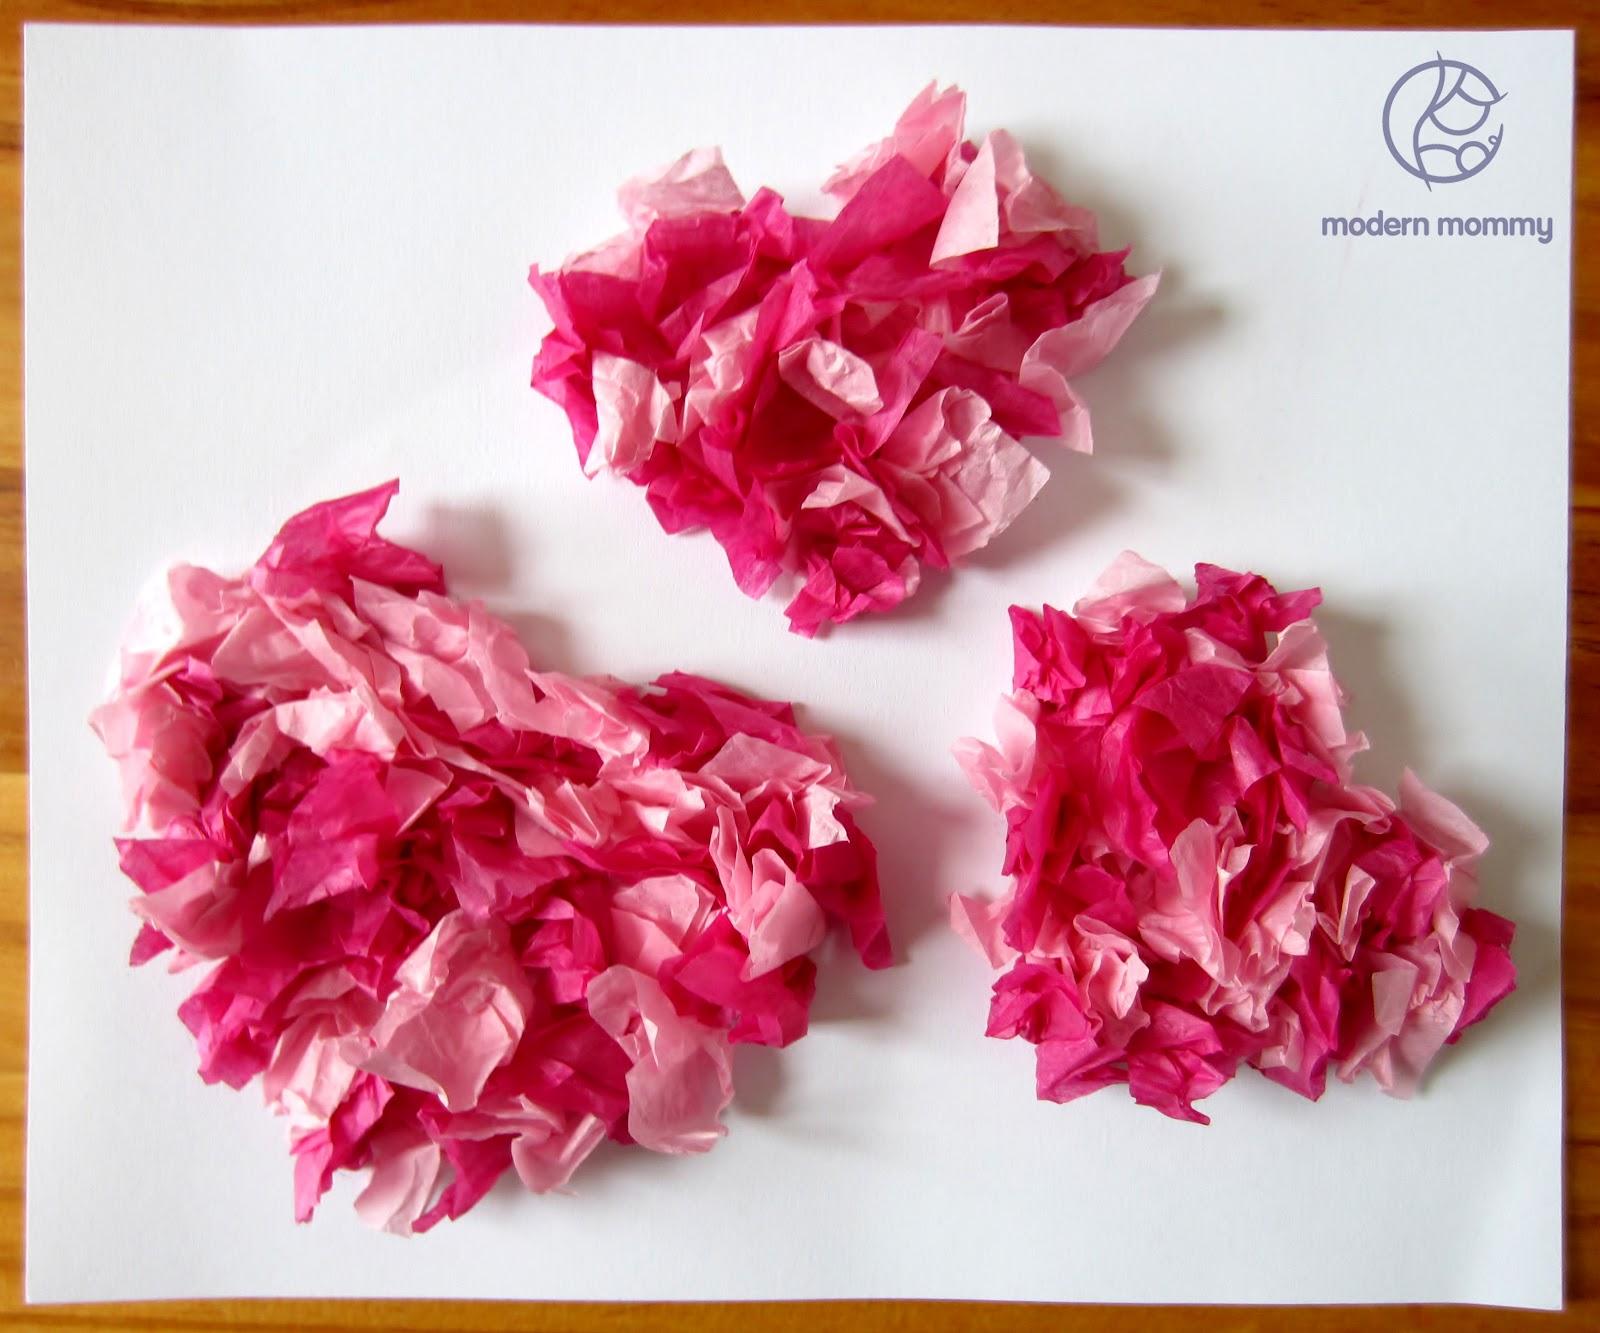 Modern Mommy: Make It Monday: Tissue Paper Heart Valentine